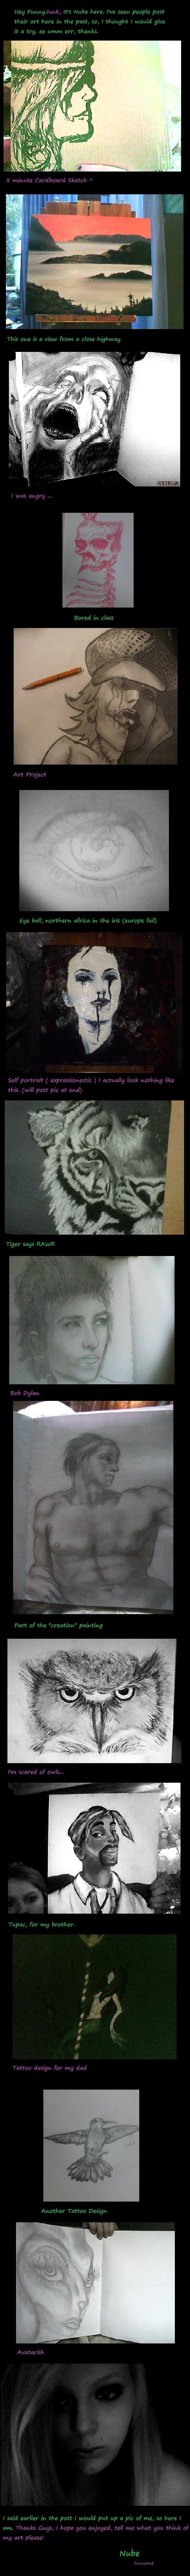 My Art. Art, funfunfun...tell me what you thinkkk, I will take requests!.